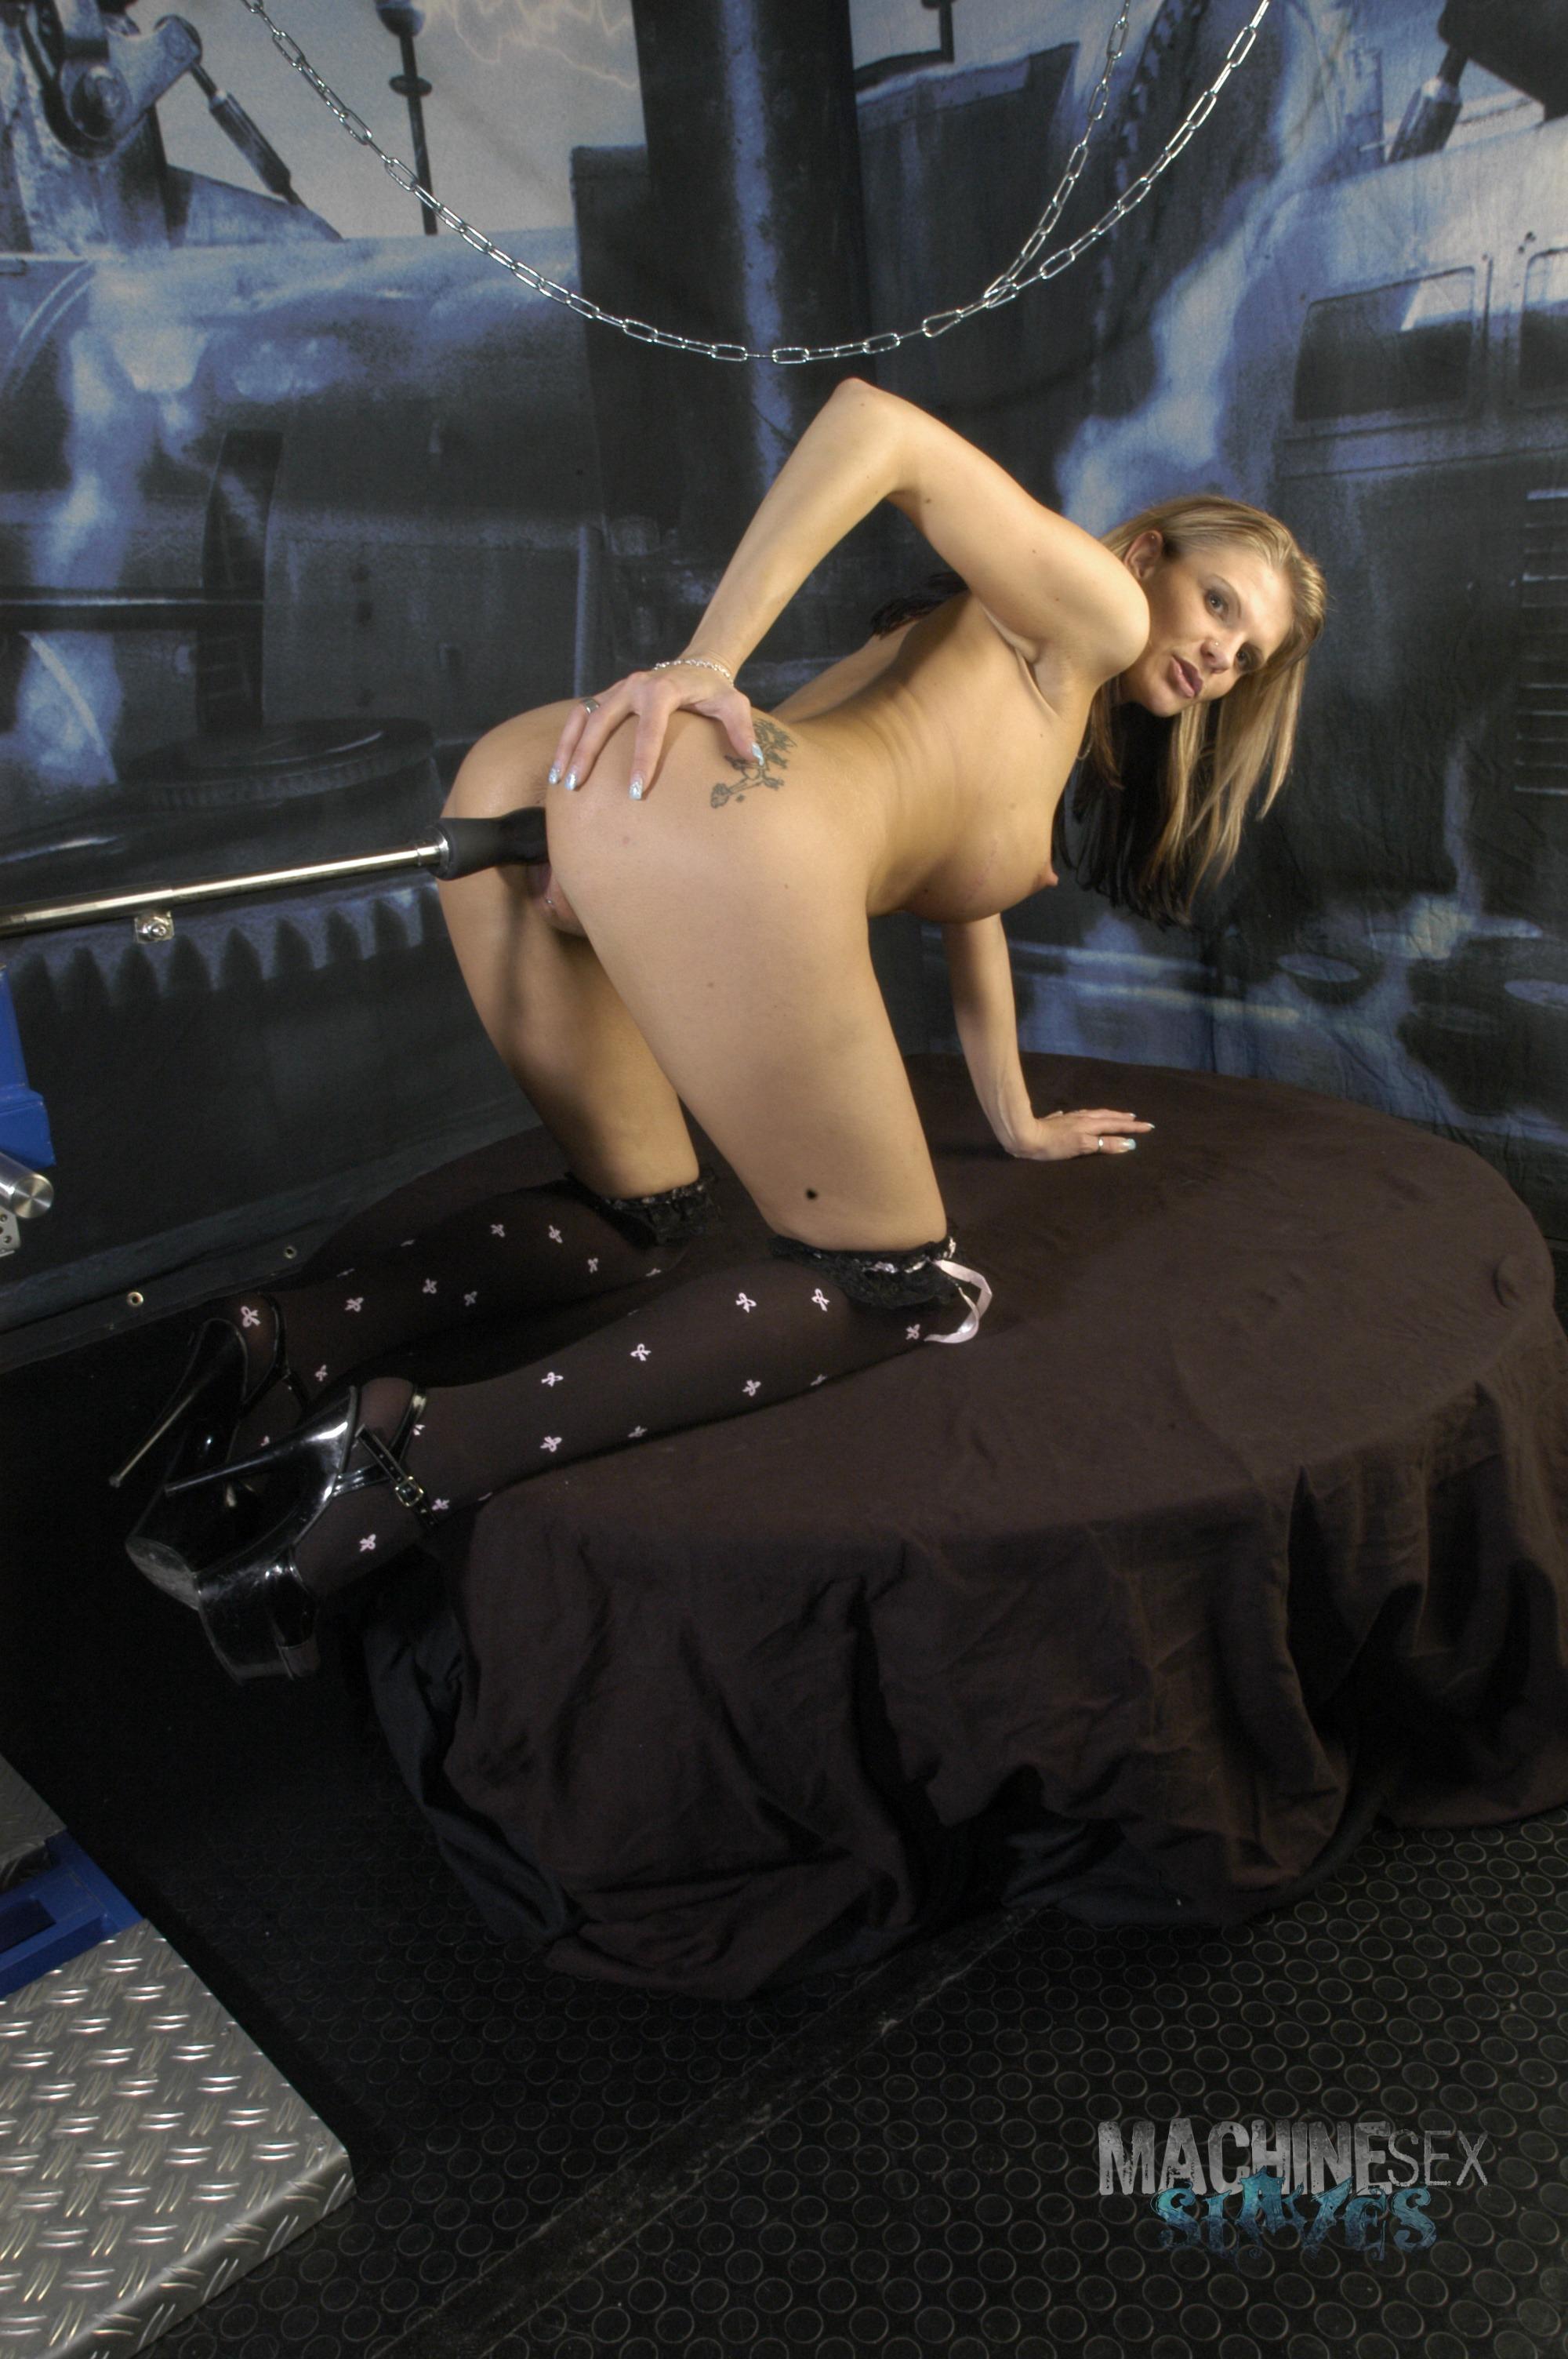 soha ali khan naked fucking